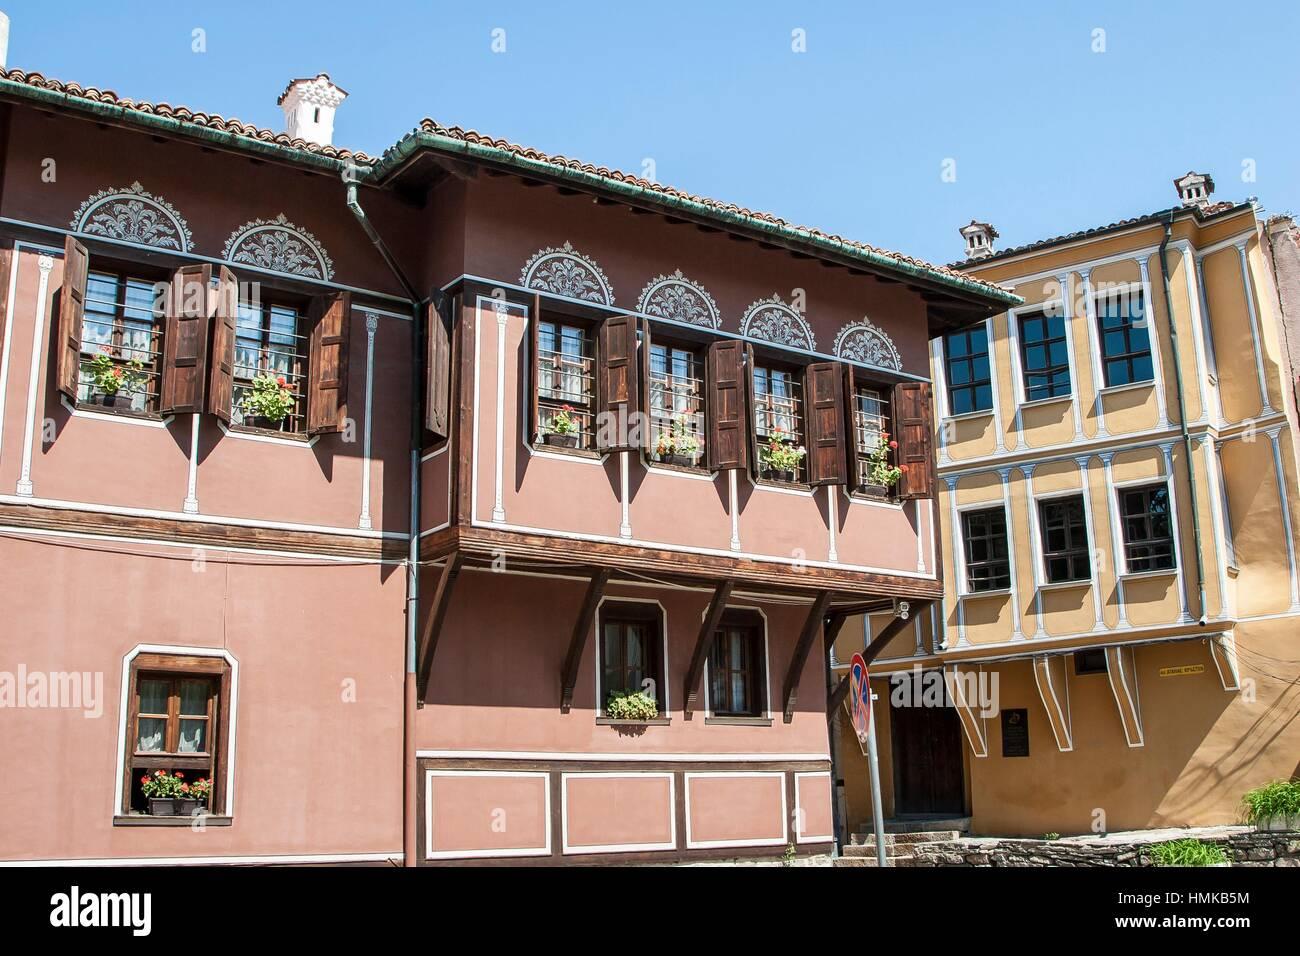 Balabanov House, Nebet height, Old Town, Plovdiv, Bulgaria. - Stock Image